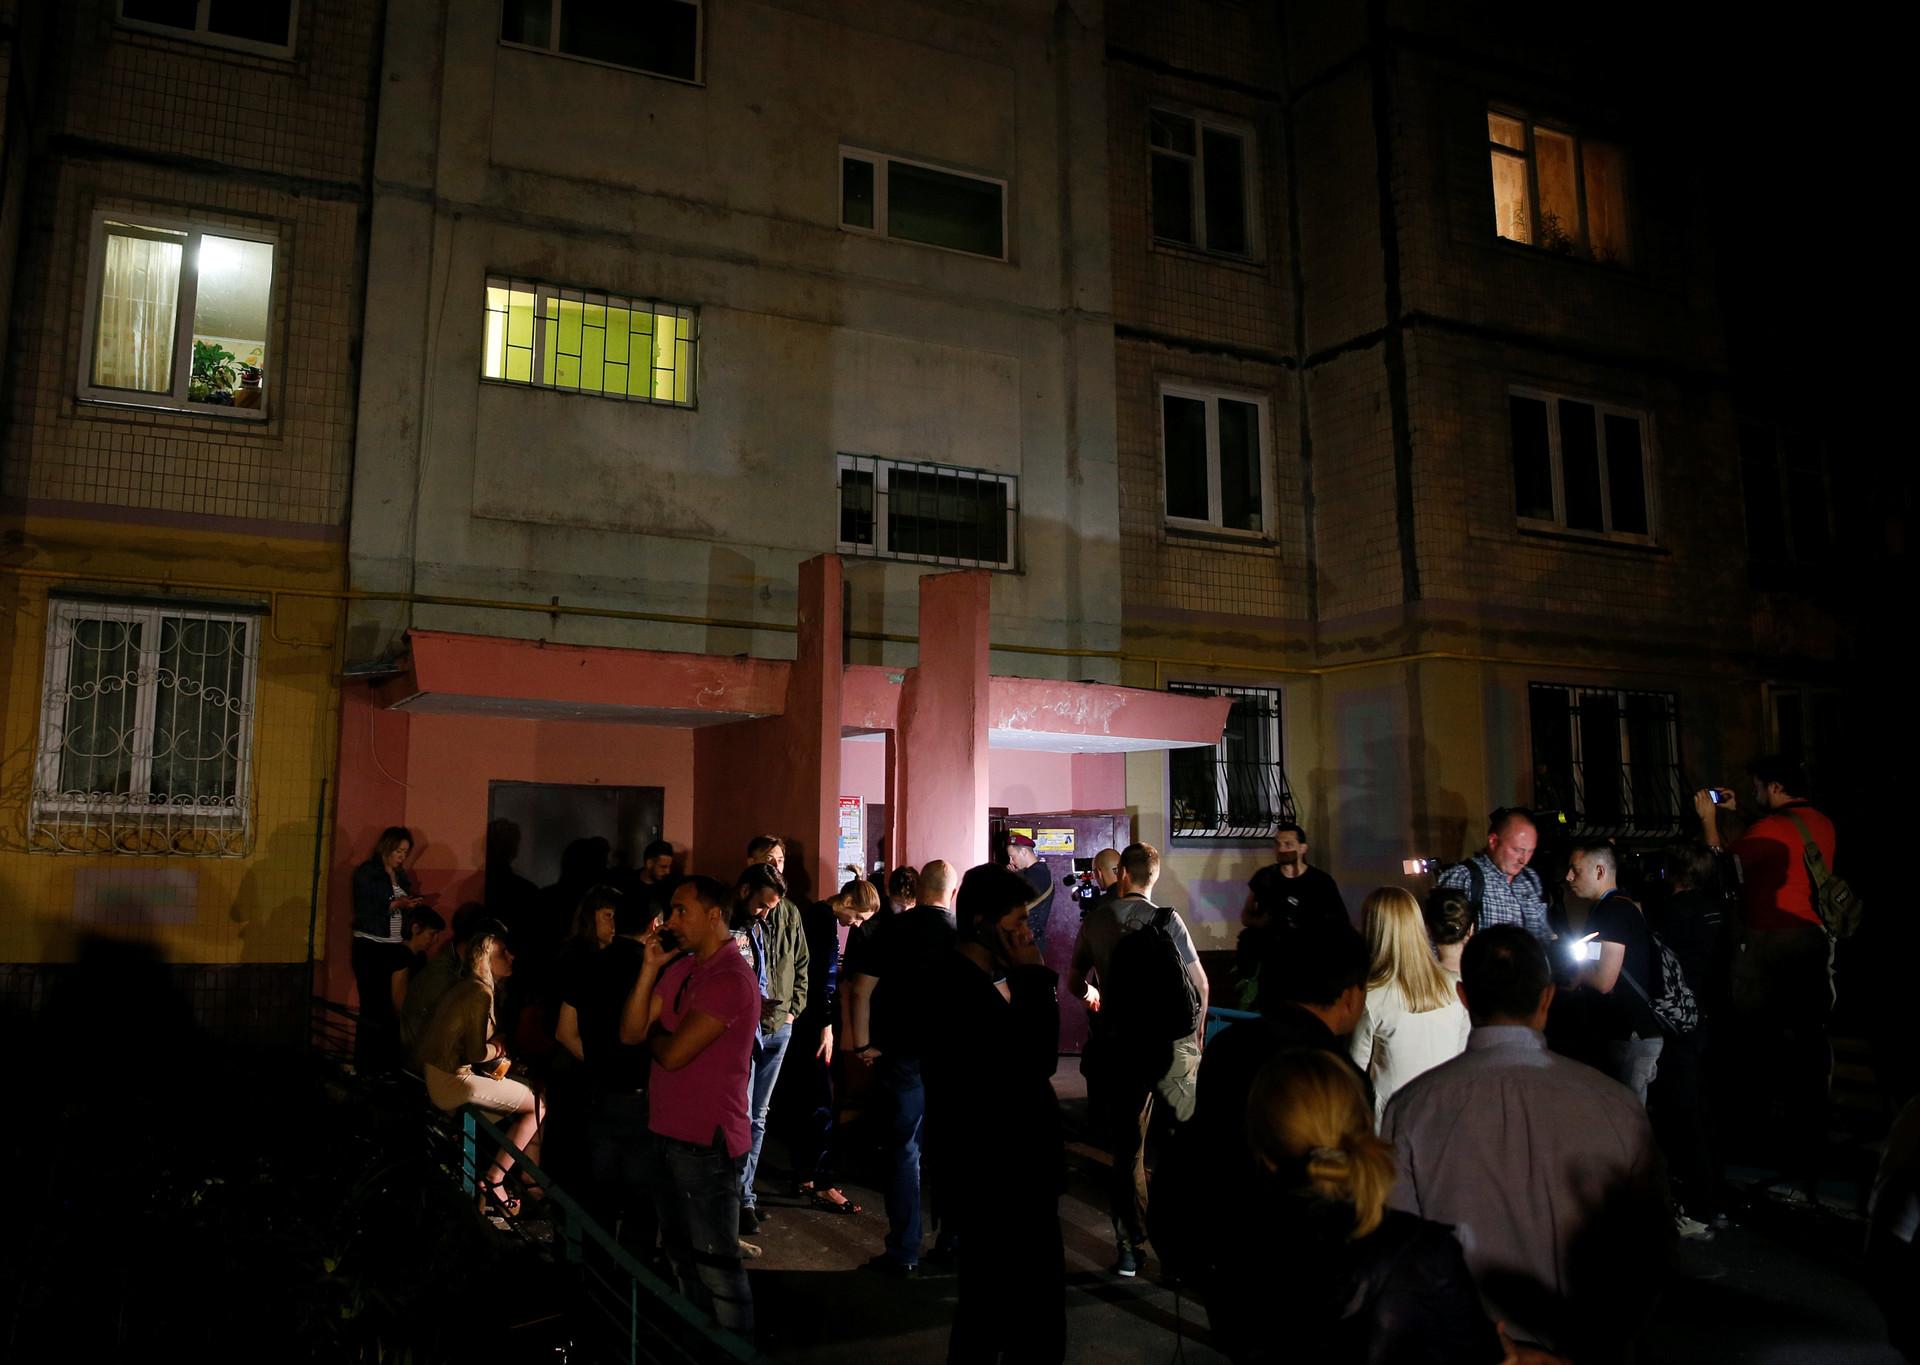 Orang-orang berkumpul di luar blok apartemen tempat Arkady Babchenko ditembak di Kiev, Ukraina, 29 Mei 2018.